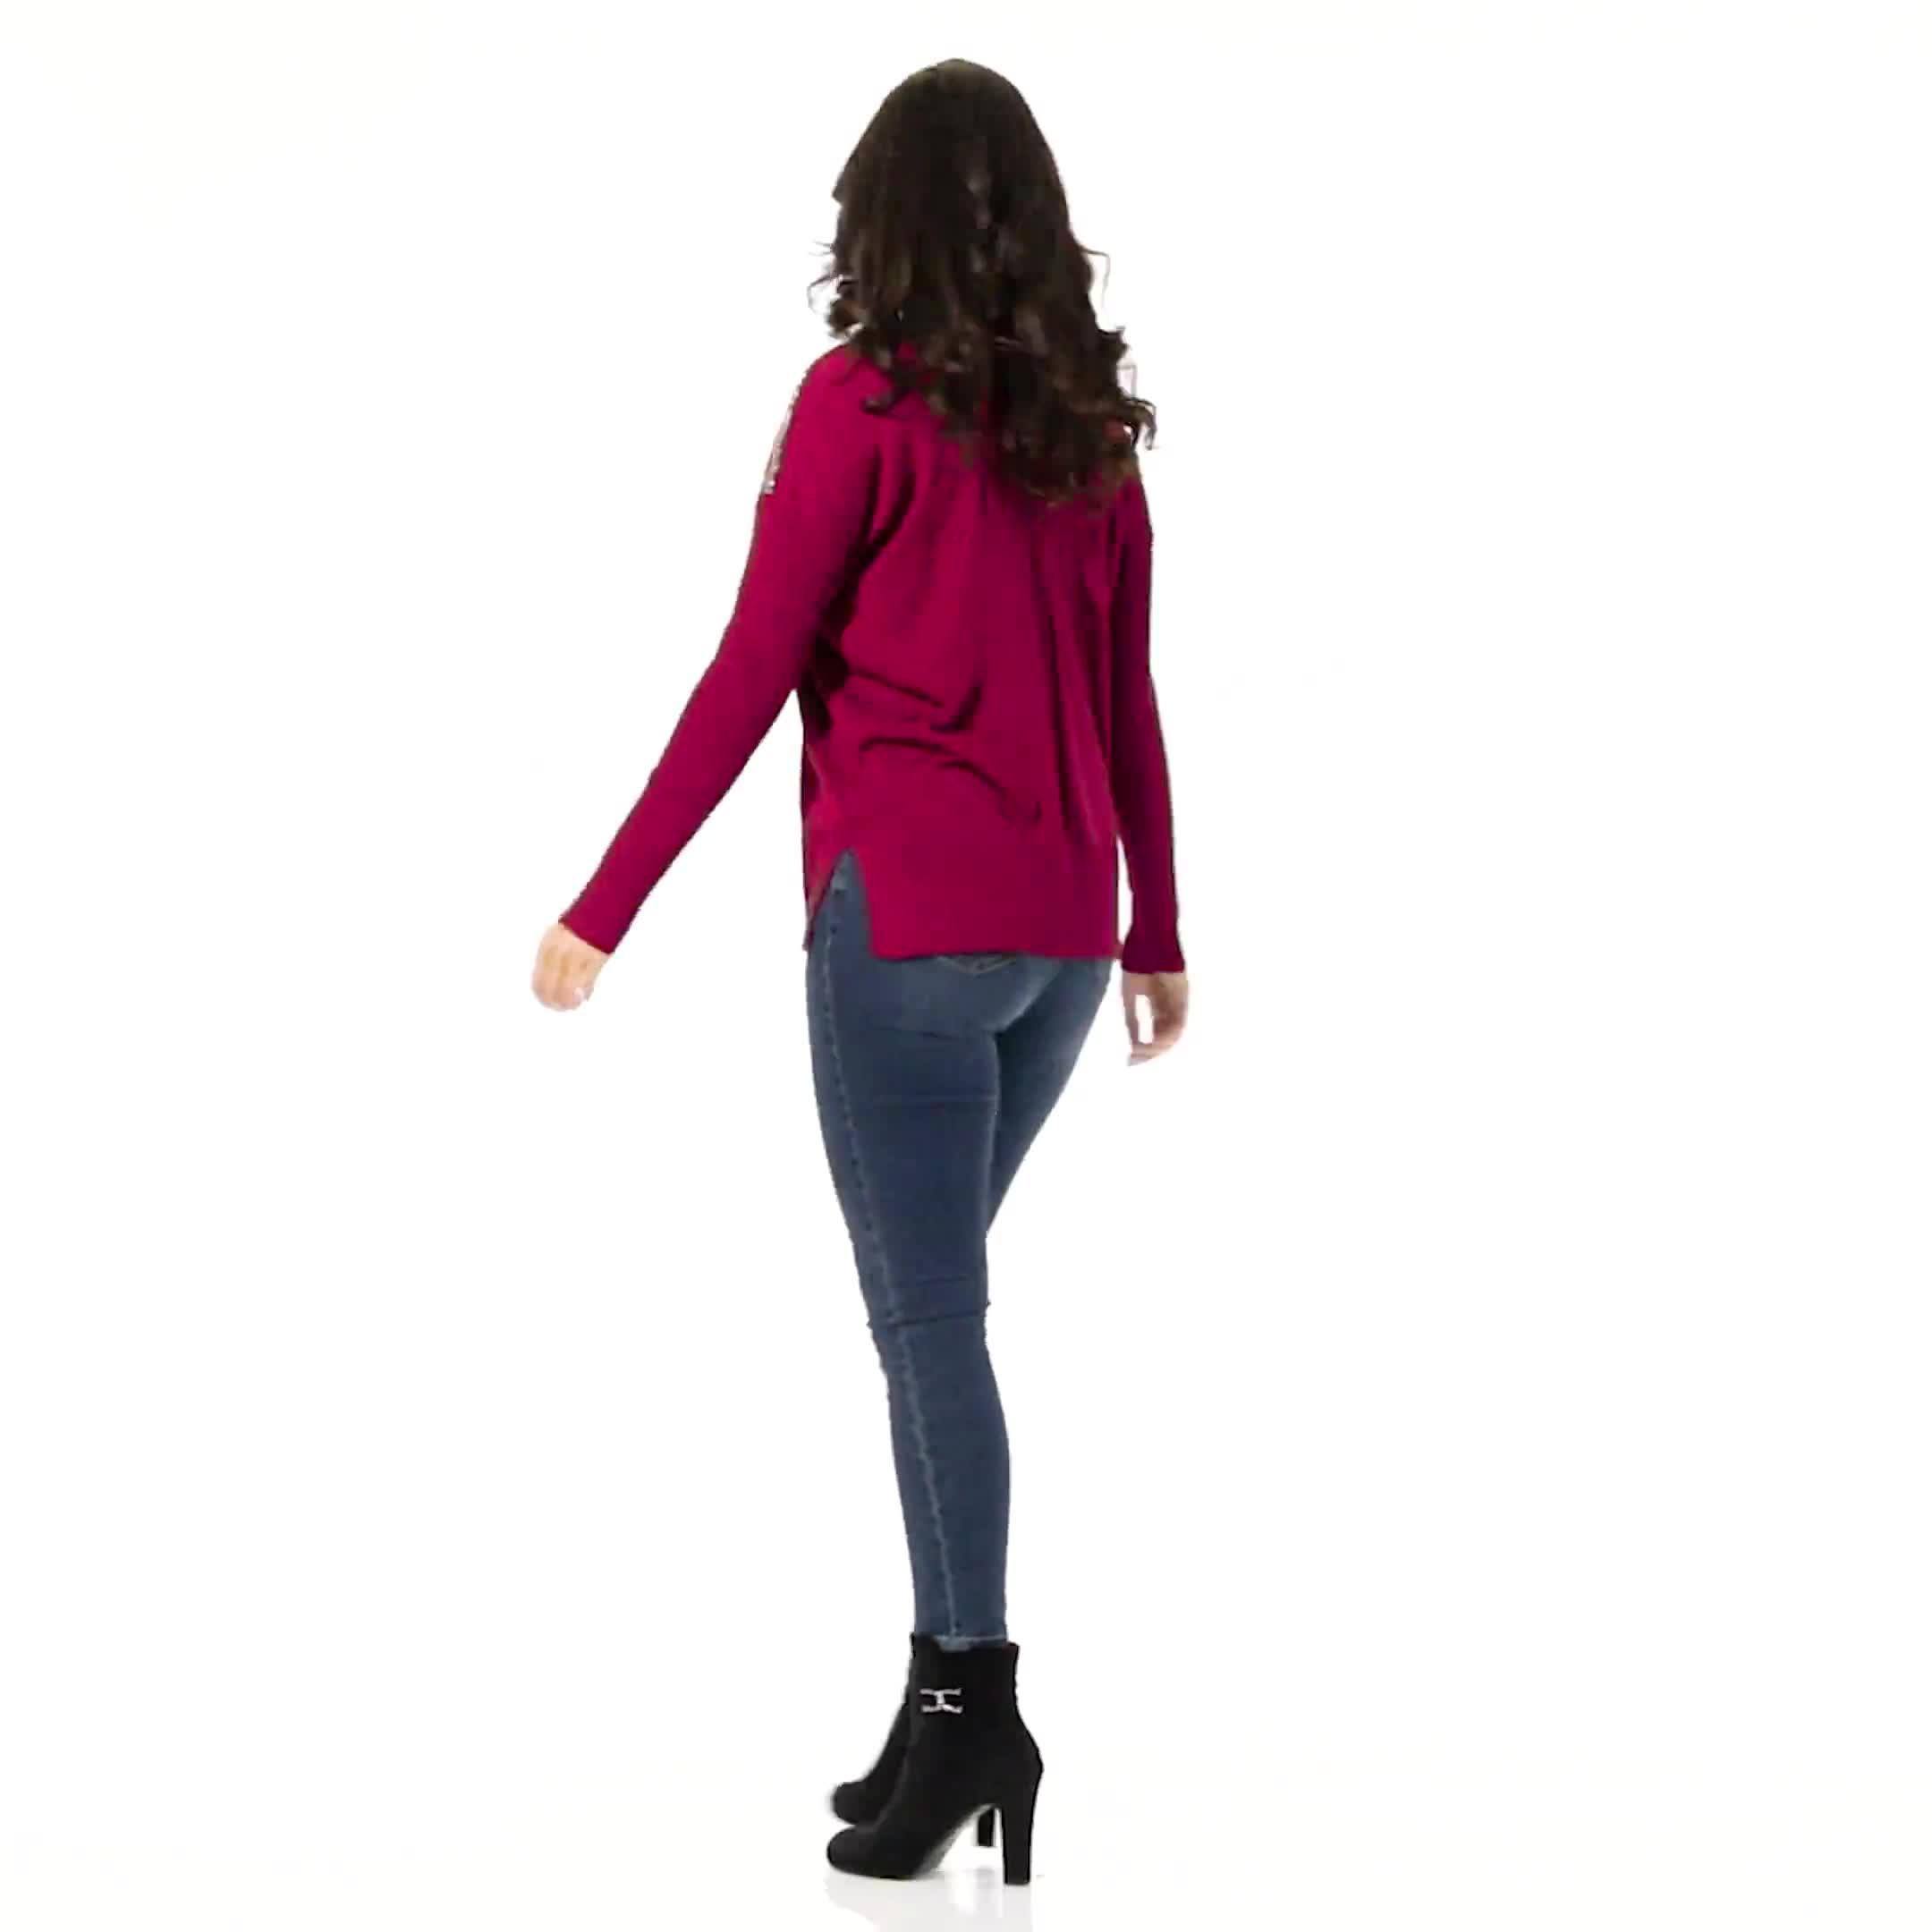 Roz & Ali Beaded Sweater Tunic - Video